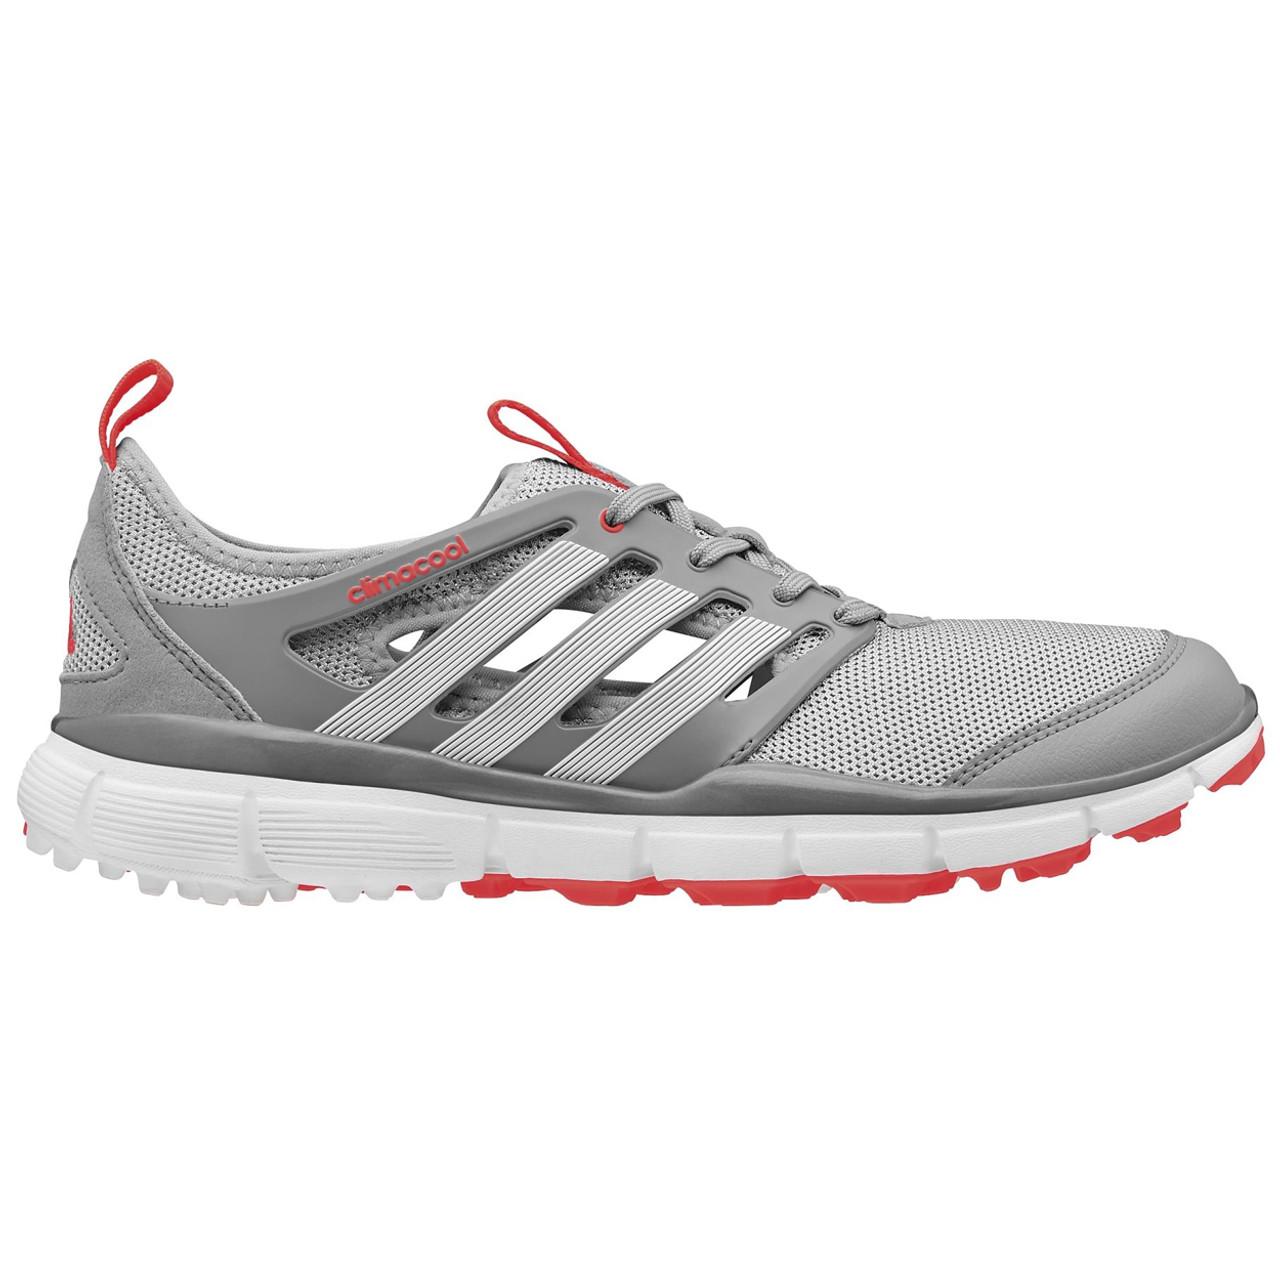 new products 33bd5 c2f5f Adidas ClimaCool II Women's Golf Shoe